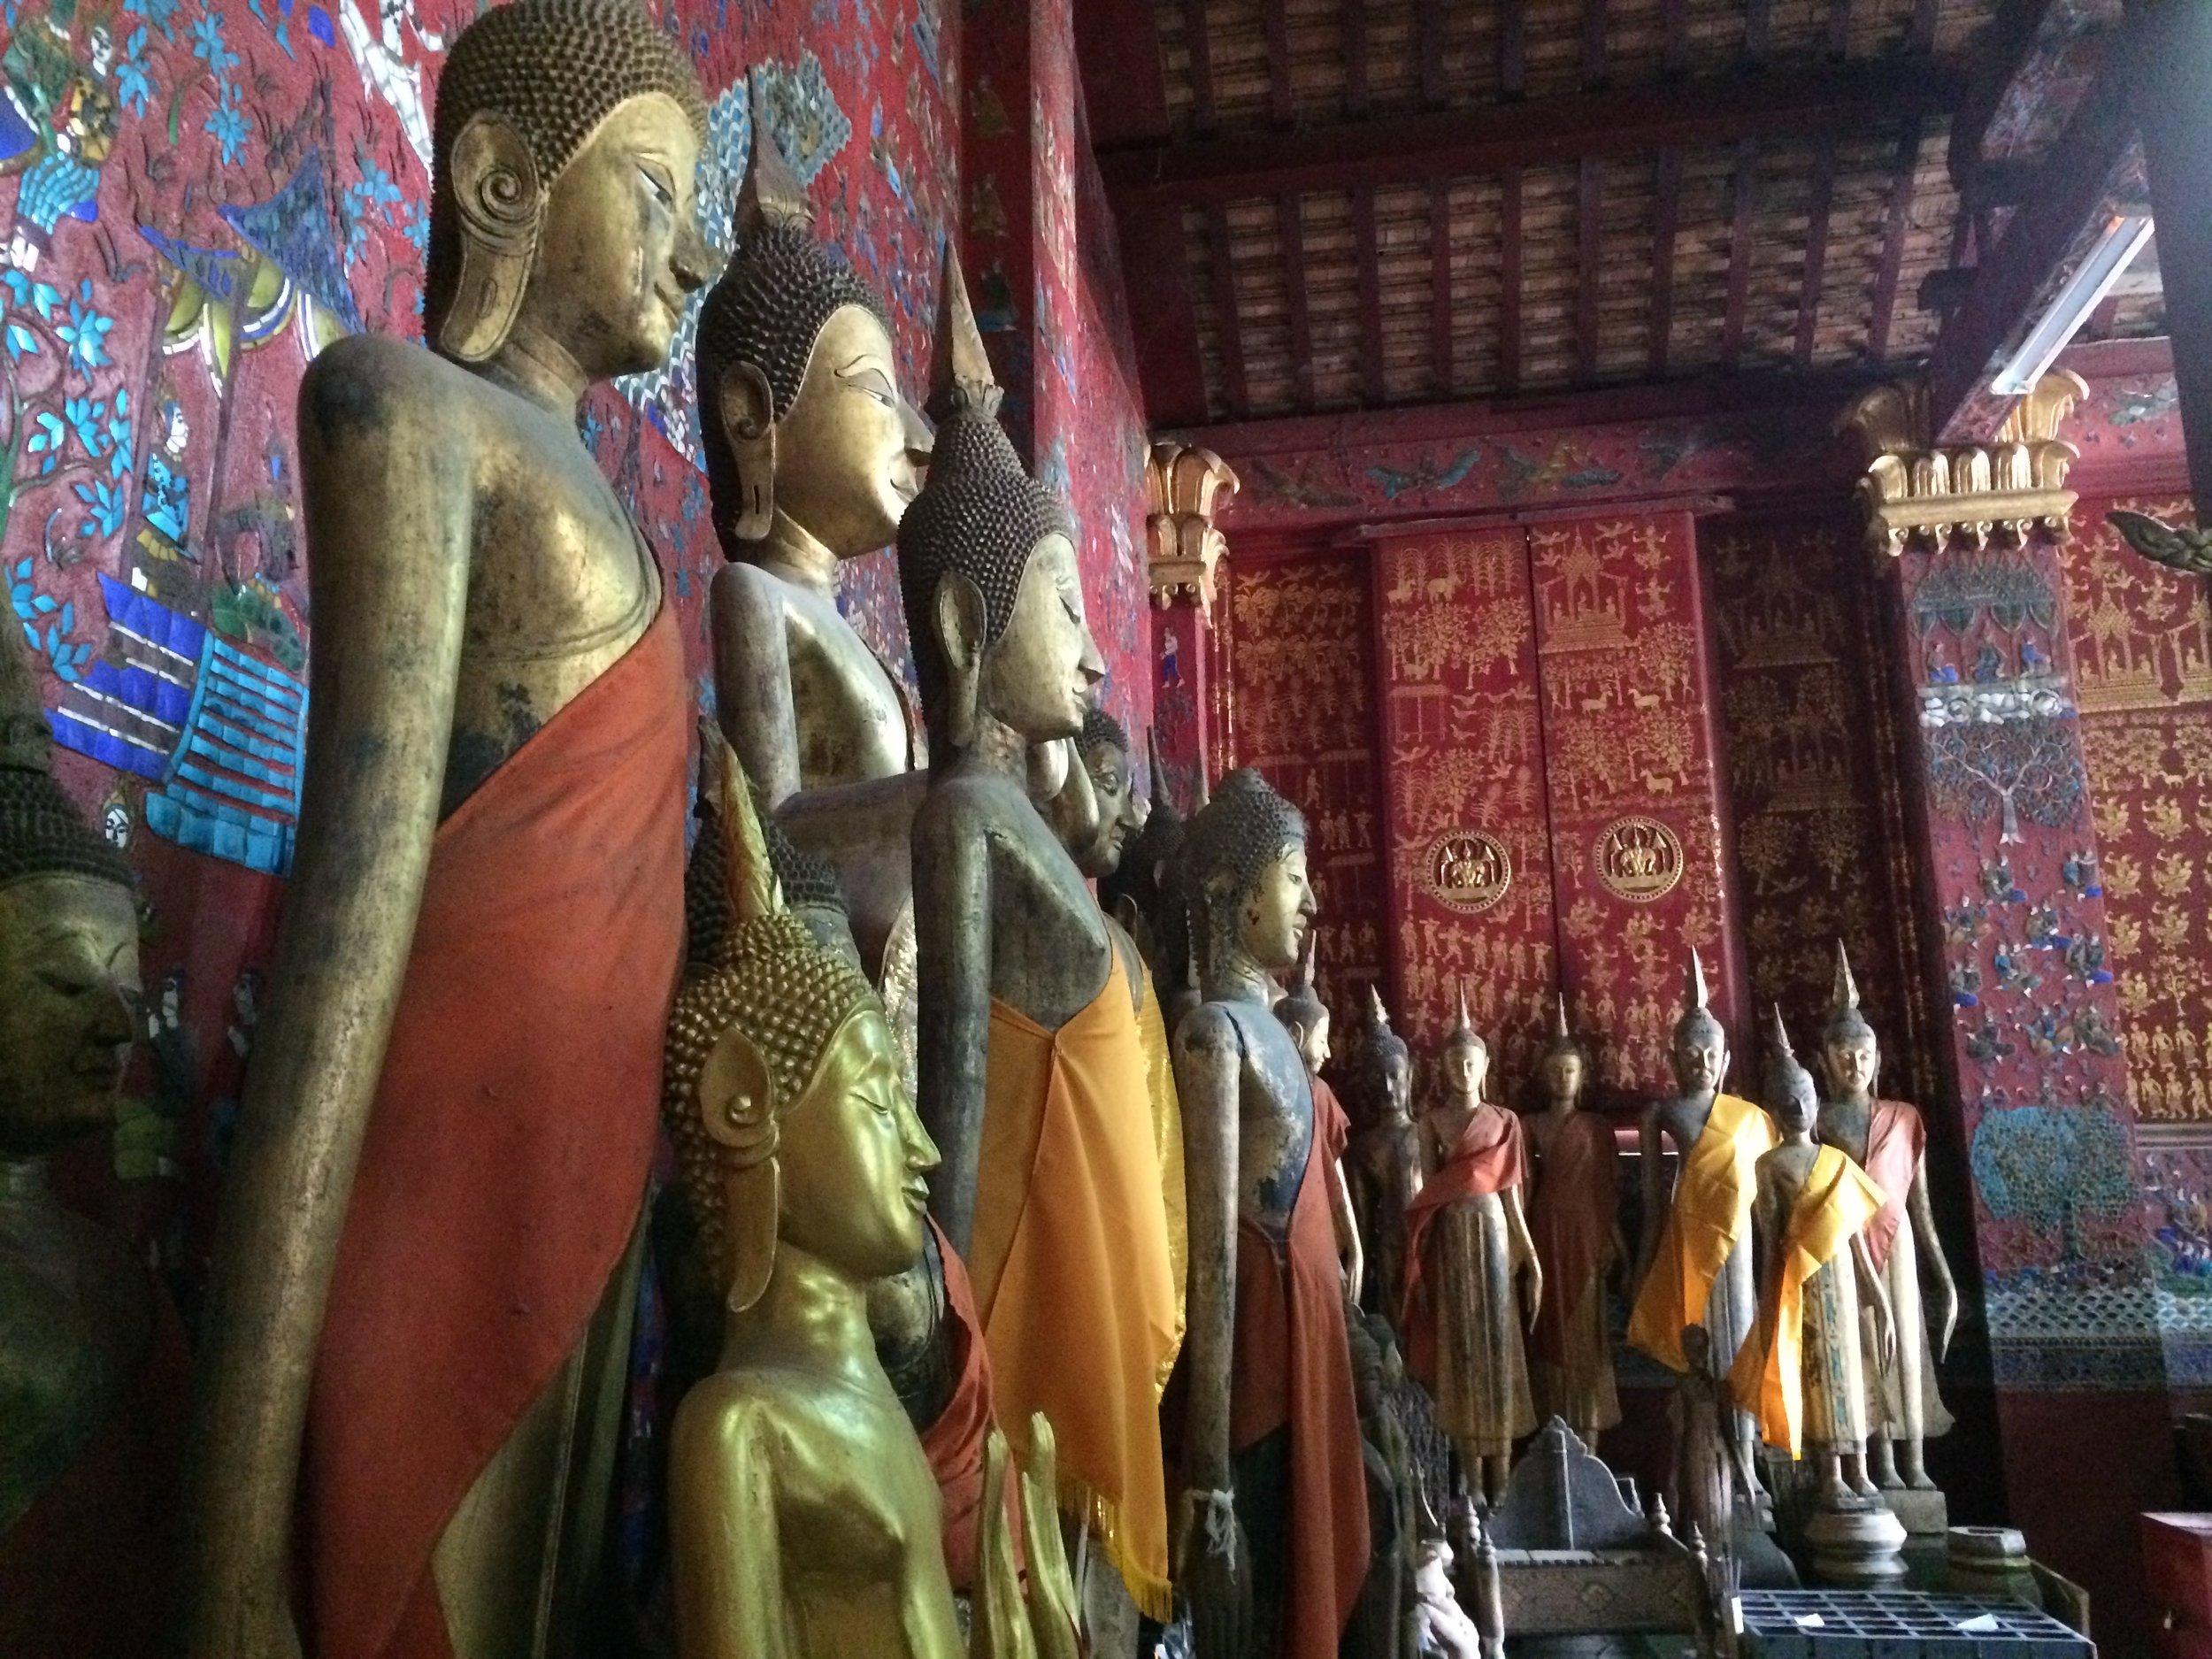 So many Buddhas.